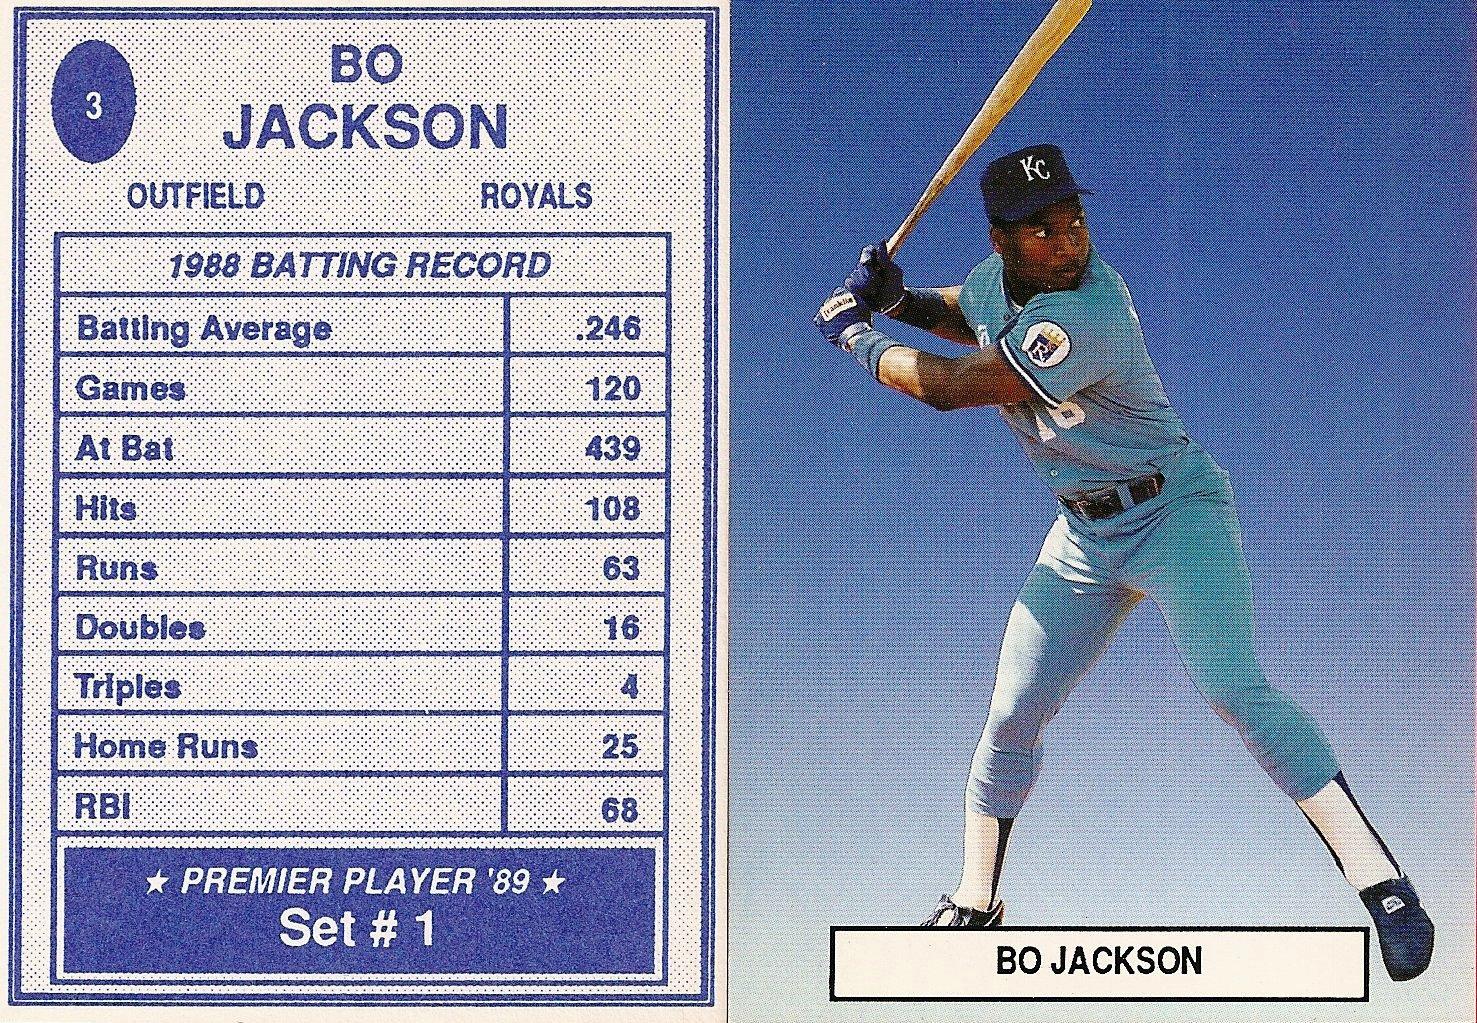 Bo Jackson Price List Supercollector Catalog